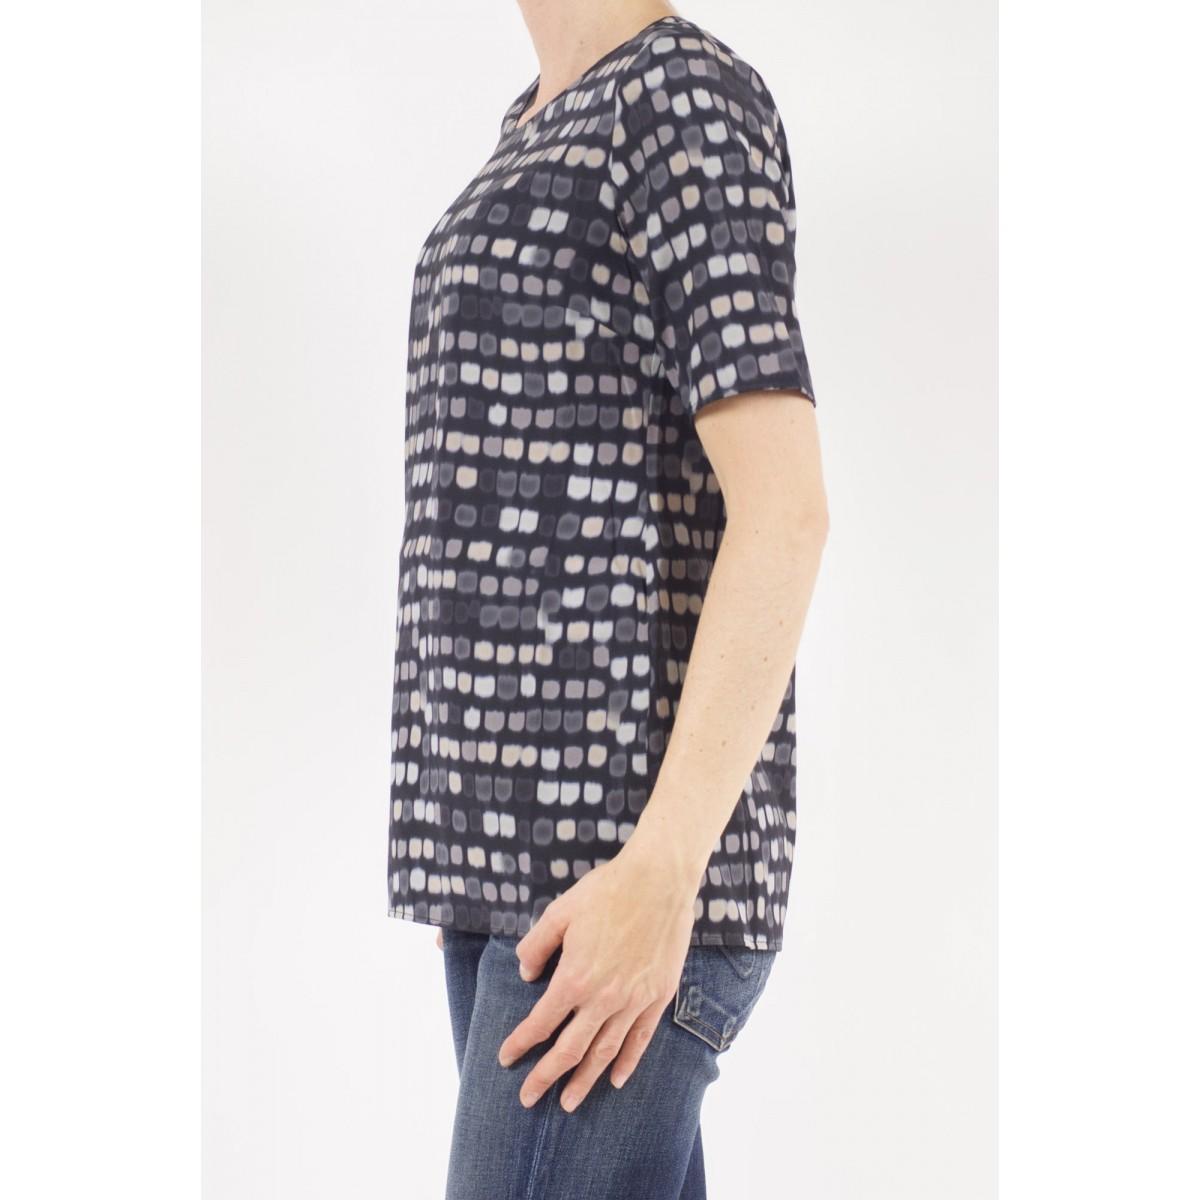 T-Shirt Woman Kangra - 7825/01 13 - Nero